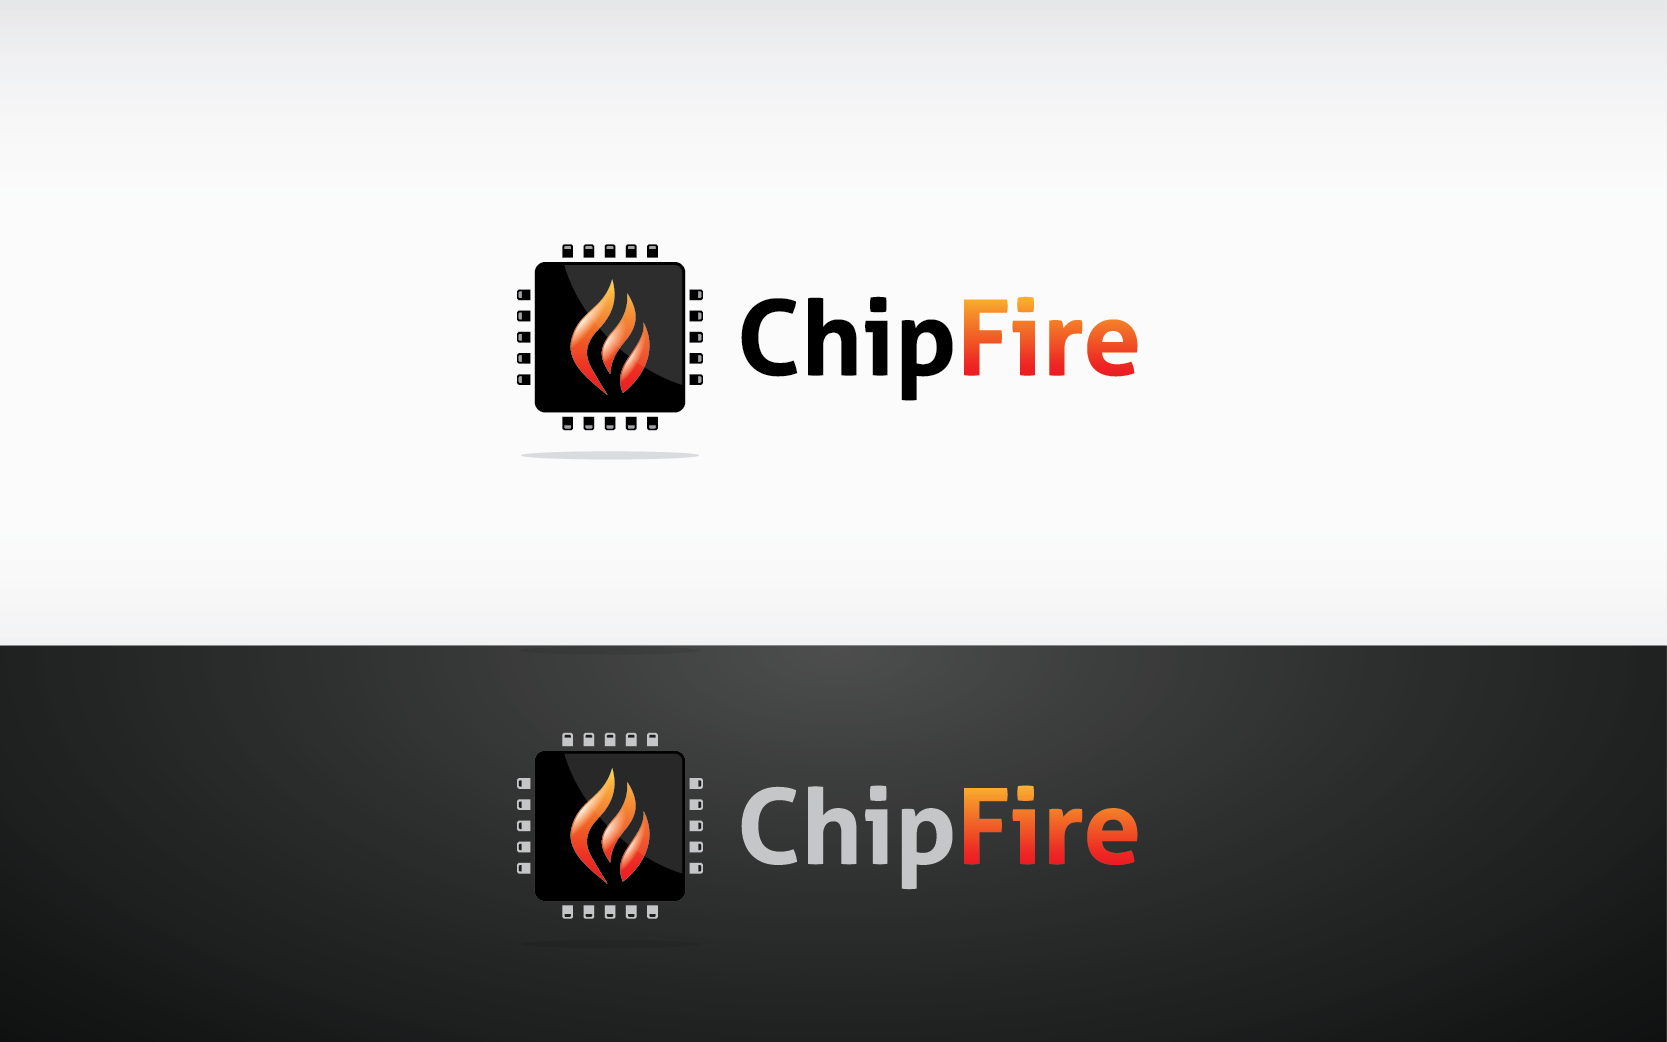 ChipFire Business Logo